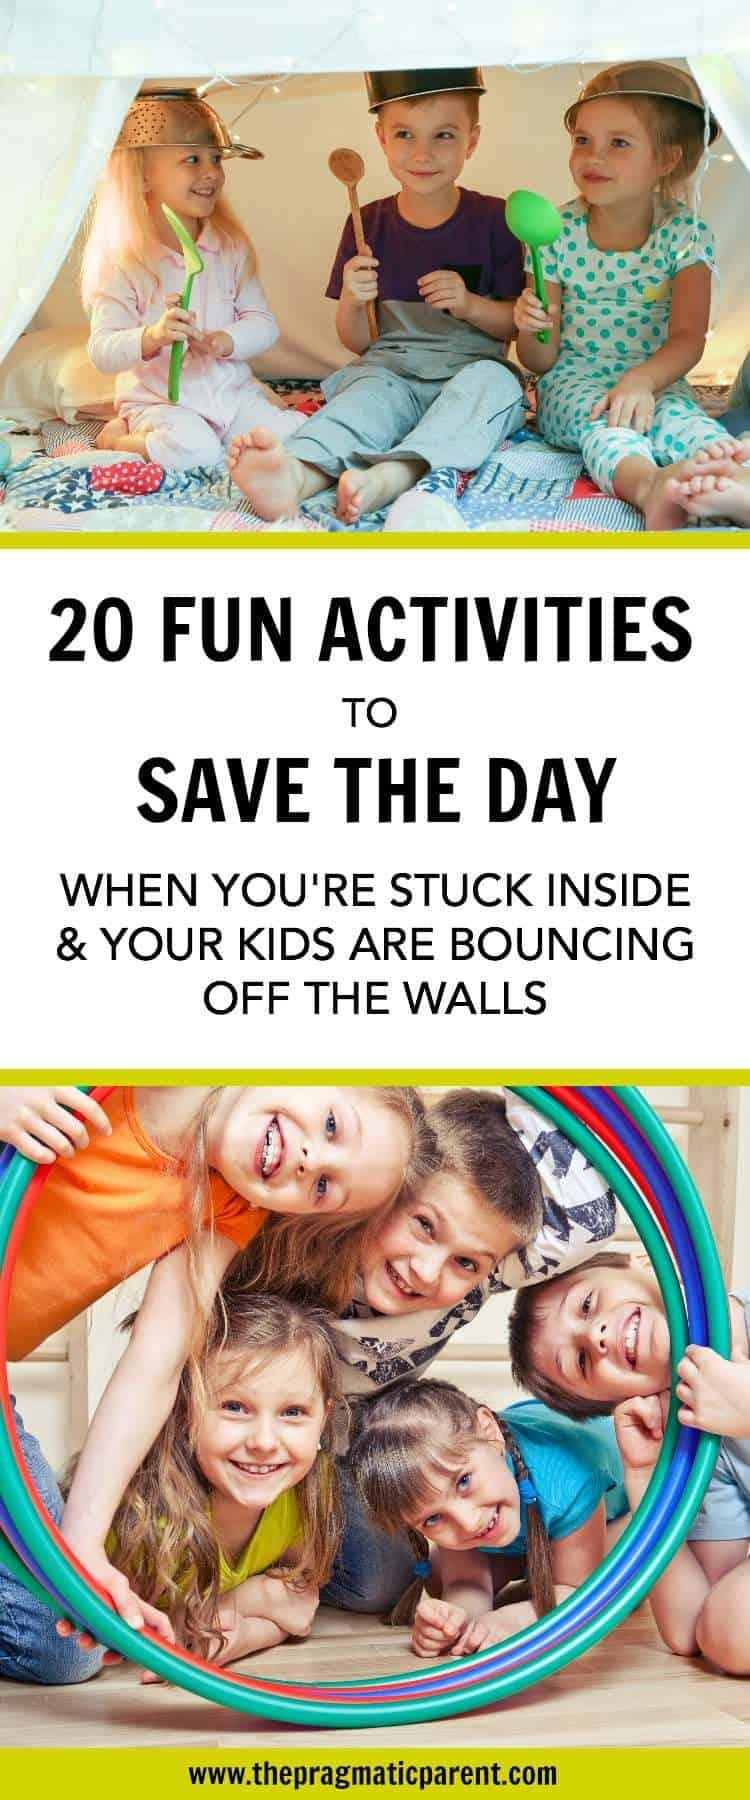 The Best Inside Activities to Entertain Kids When You're Stuck Indoors